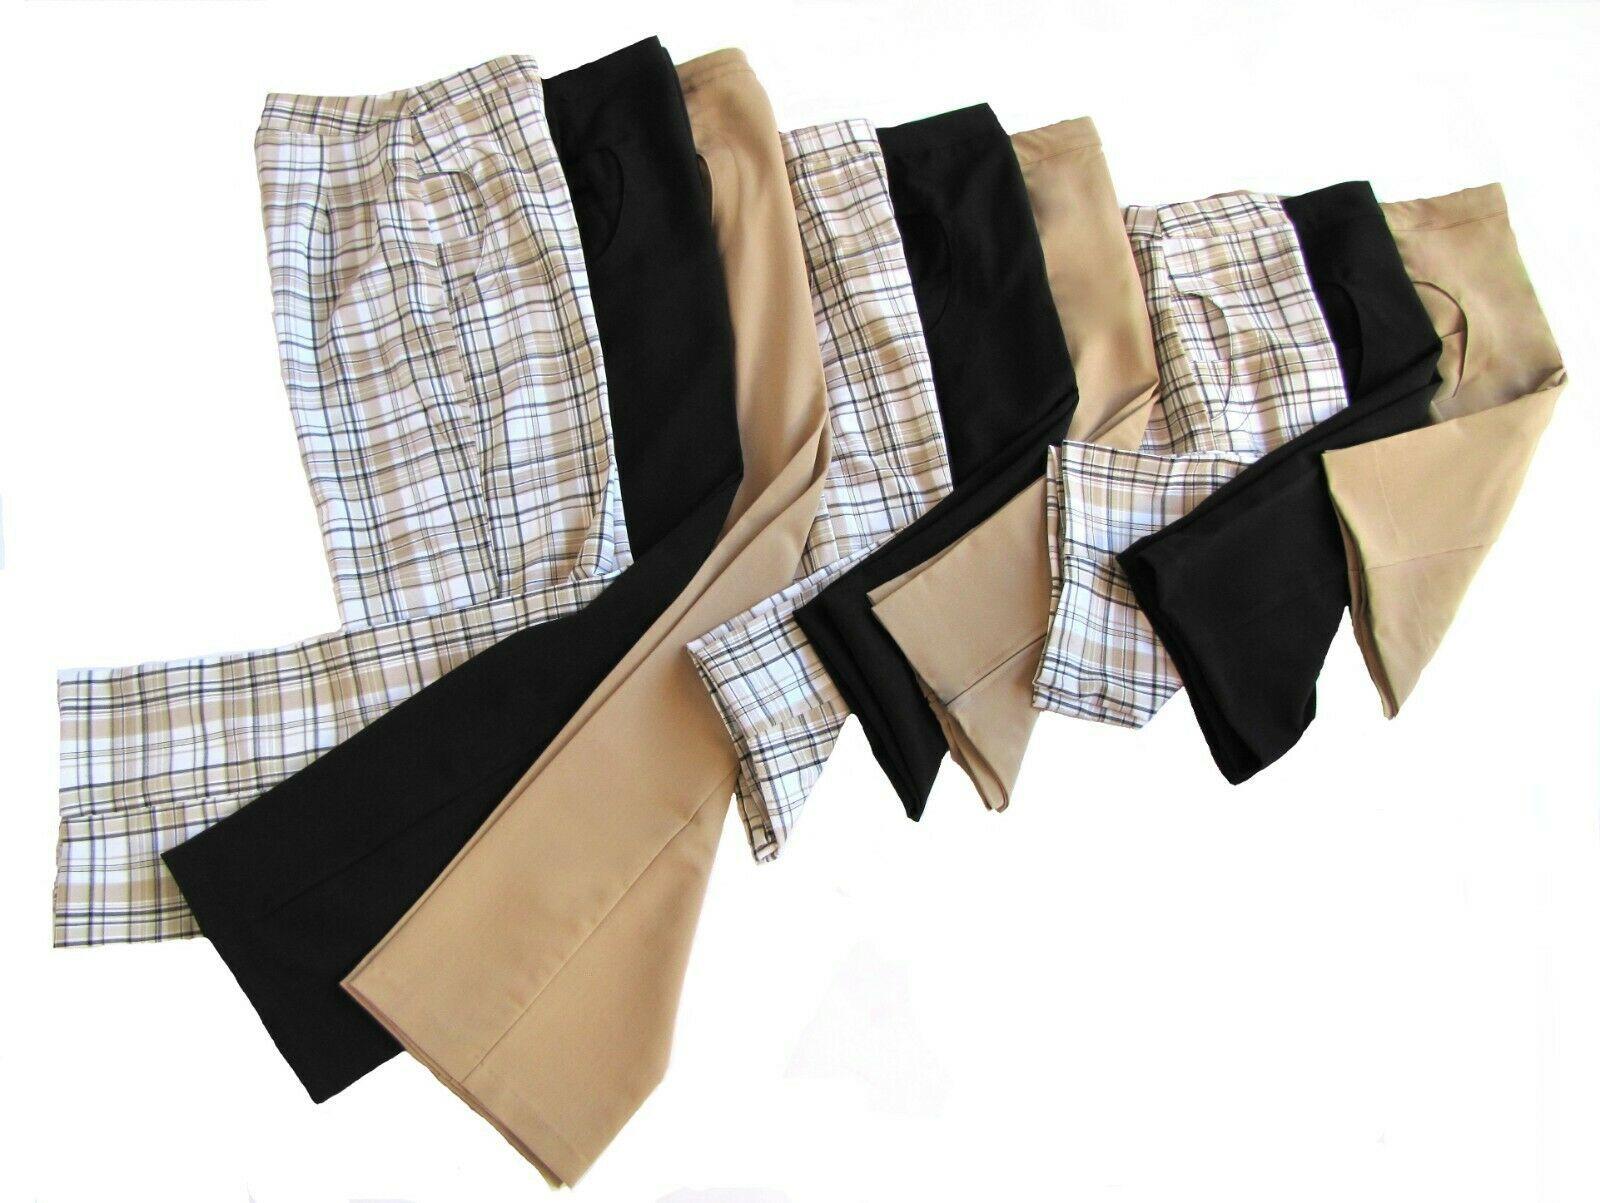 Stylish Women's Golf & Casual Sleeveless White Mock Polo, Rhinestone Zipper image 5